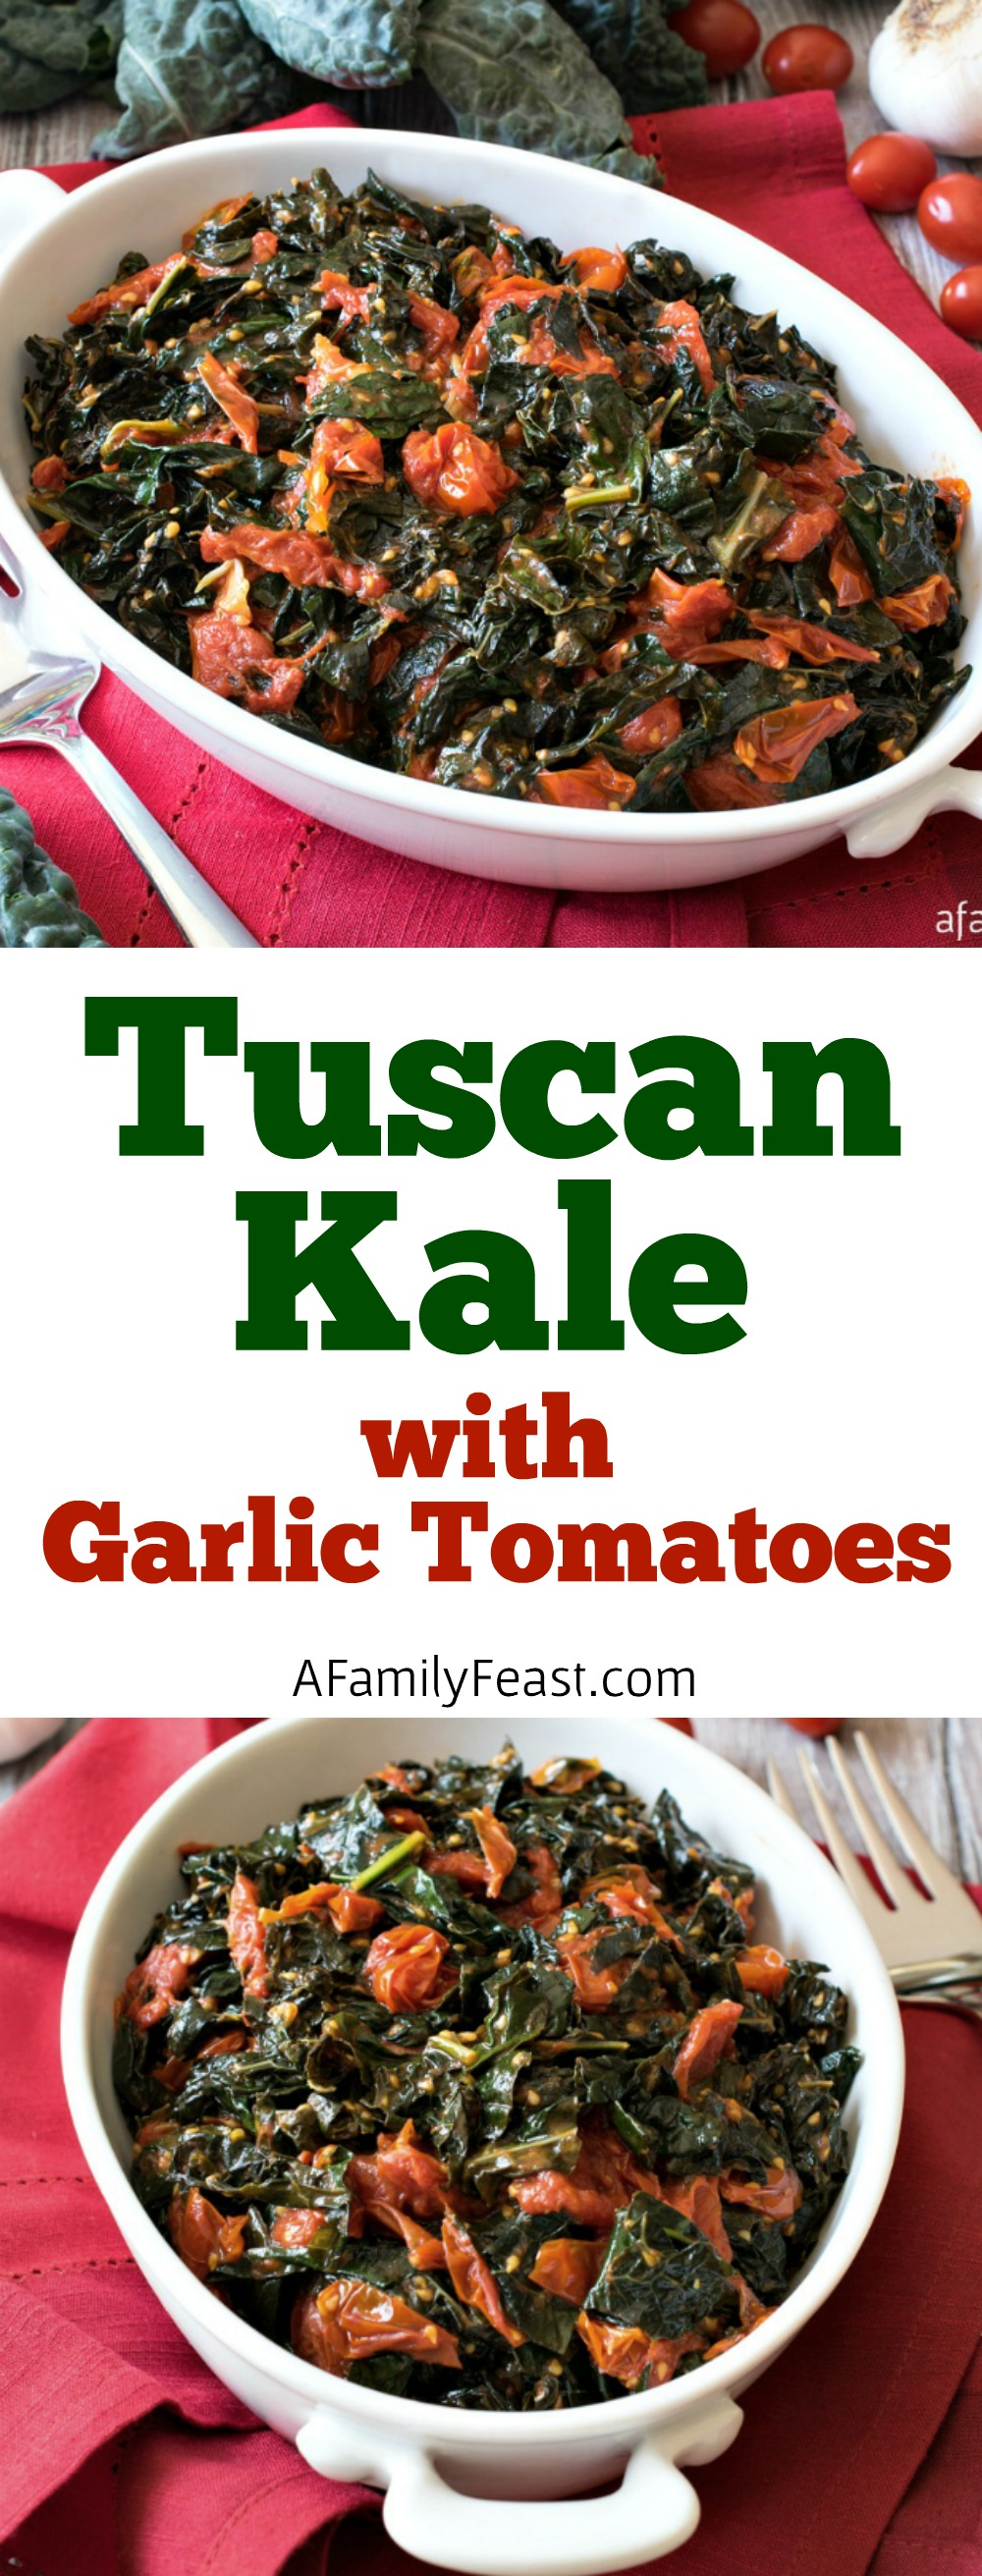 Tuscan Kale with Garlic Tomatoes